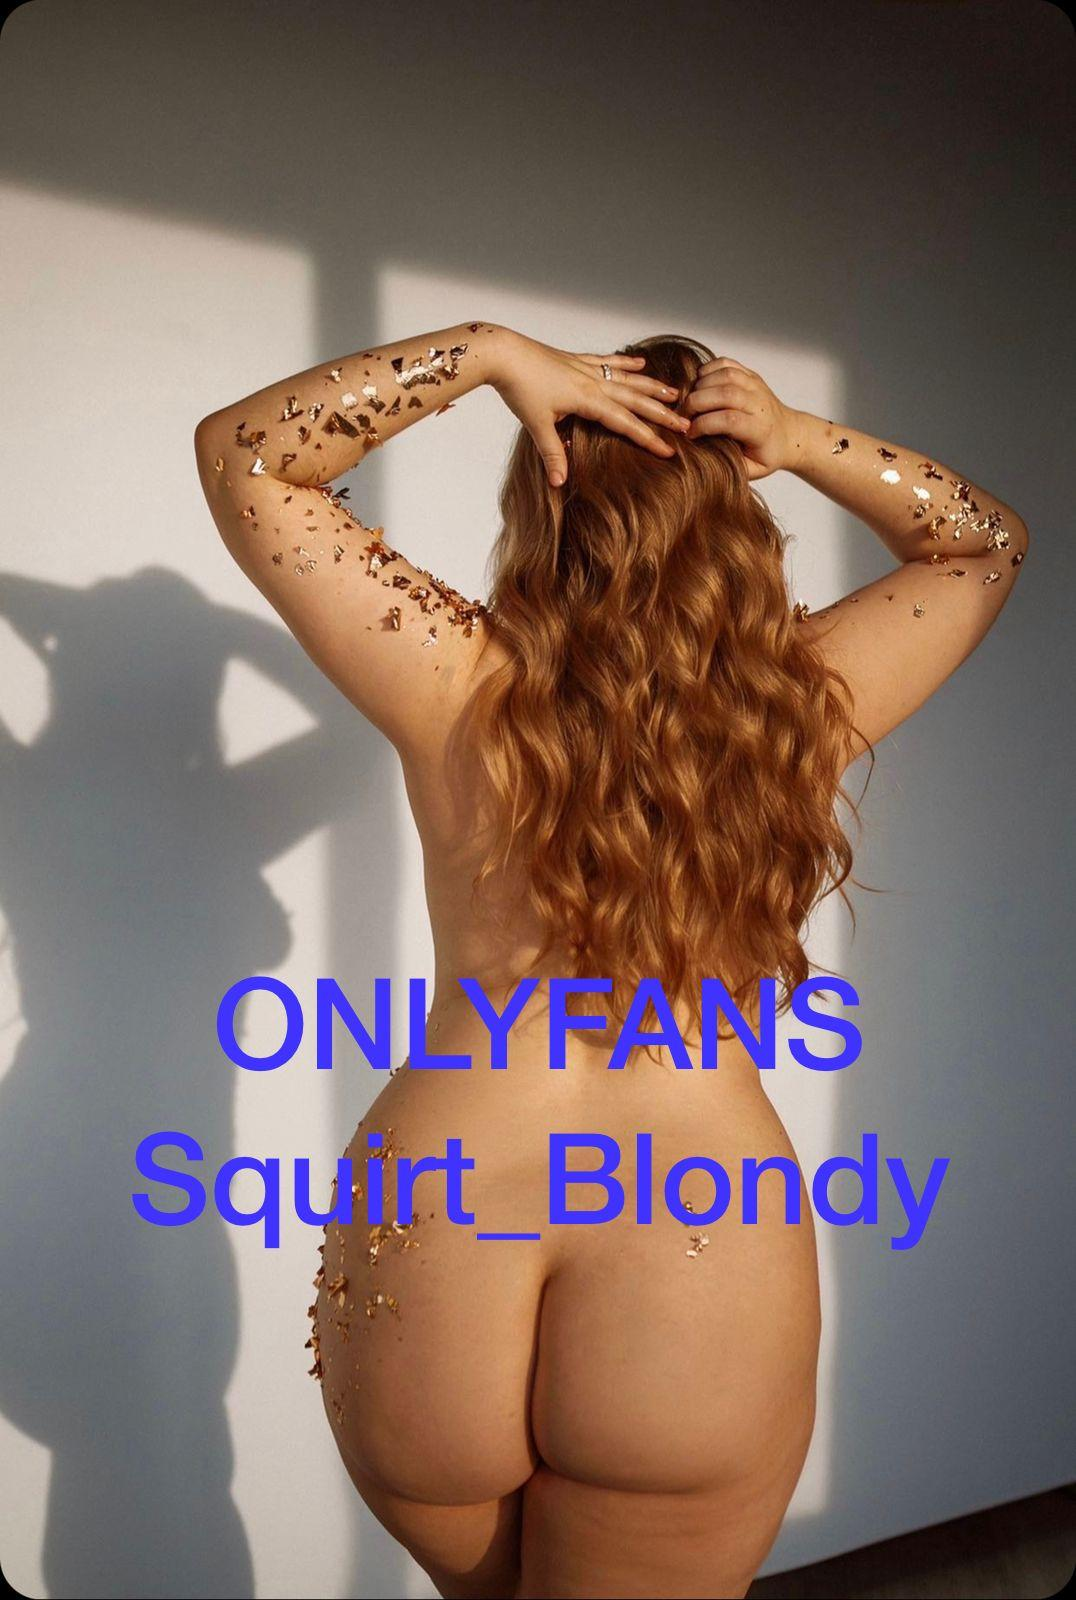 Squirt blondy?s=wwh3rajtxdsvocx83kt642phtz6fq559tyurgmqlj00=